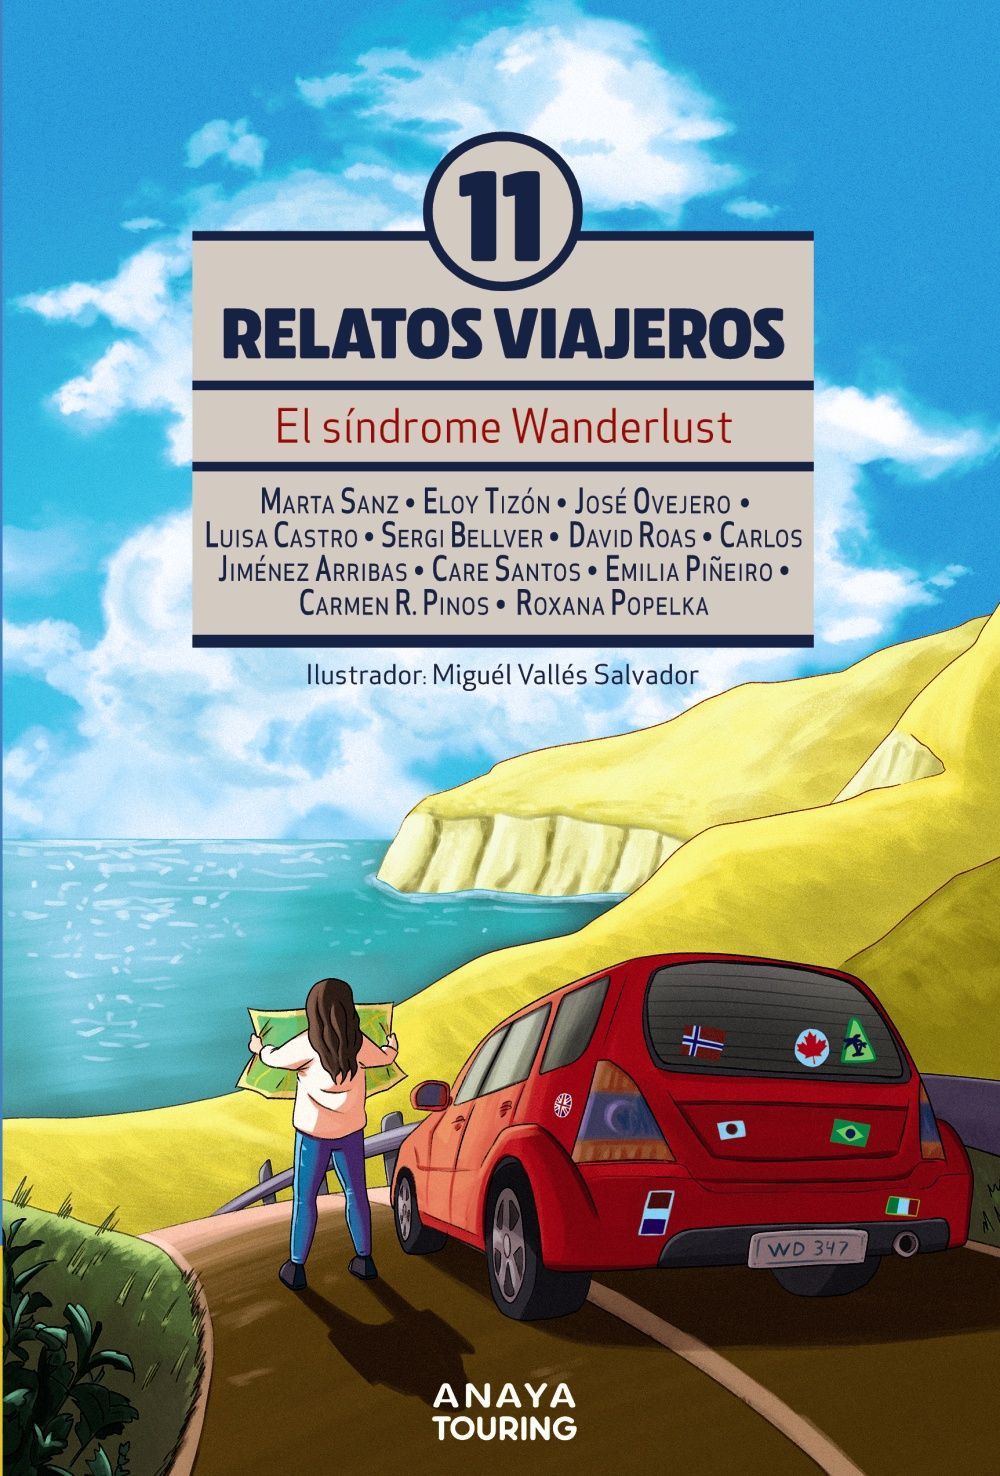 11 RELATOS VIAJEROS EL SINDROME DE WANDERLUST